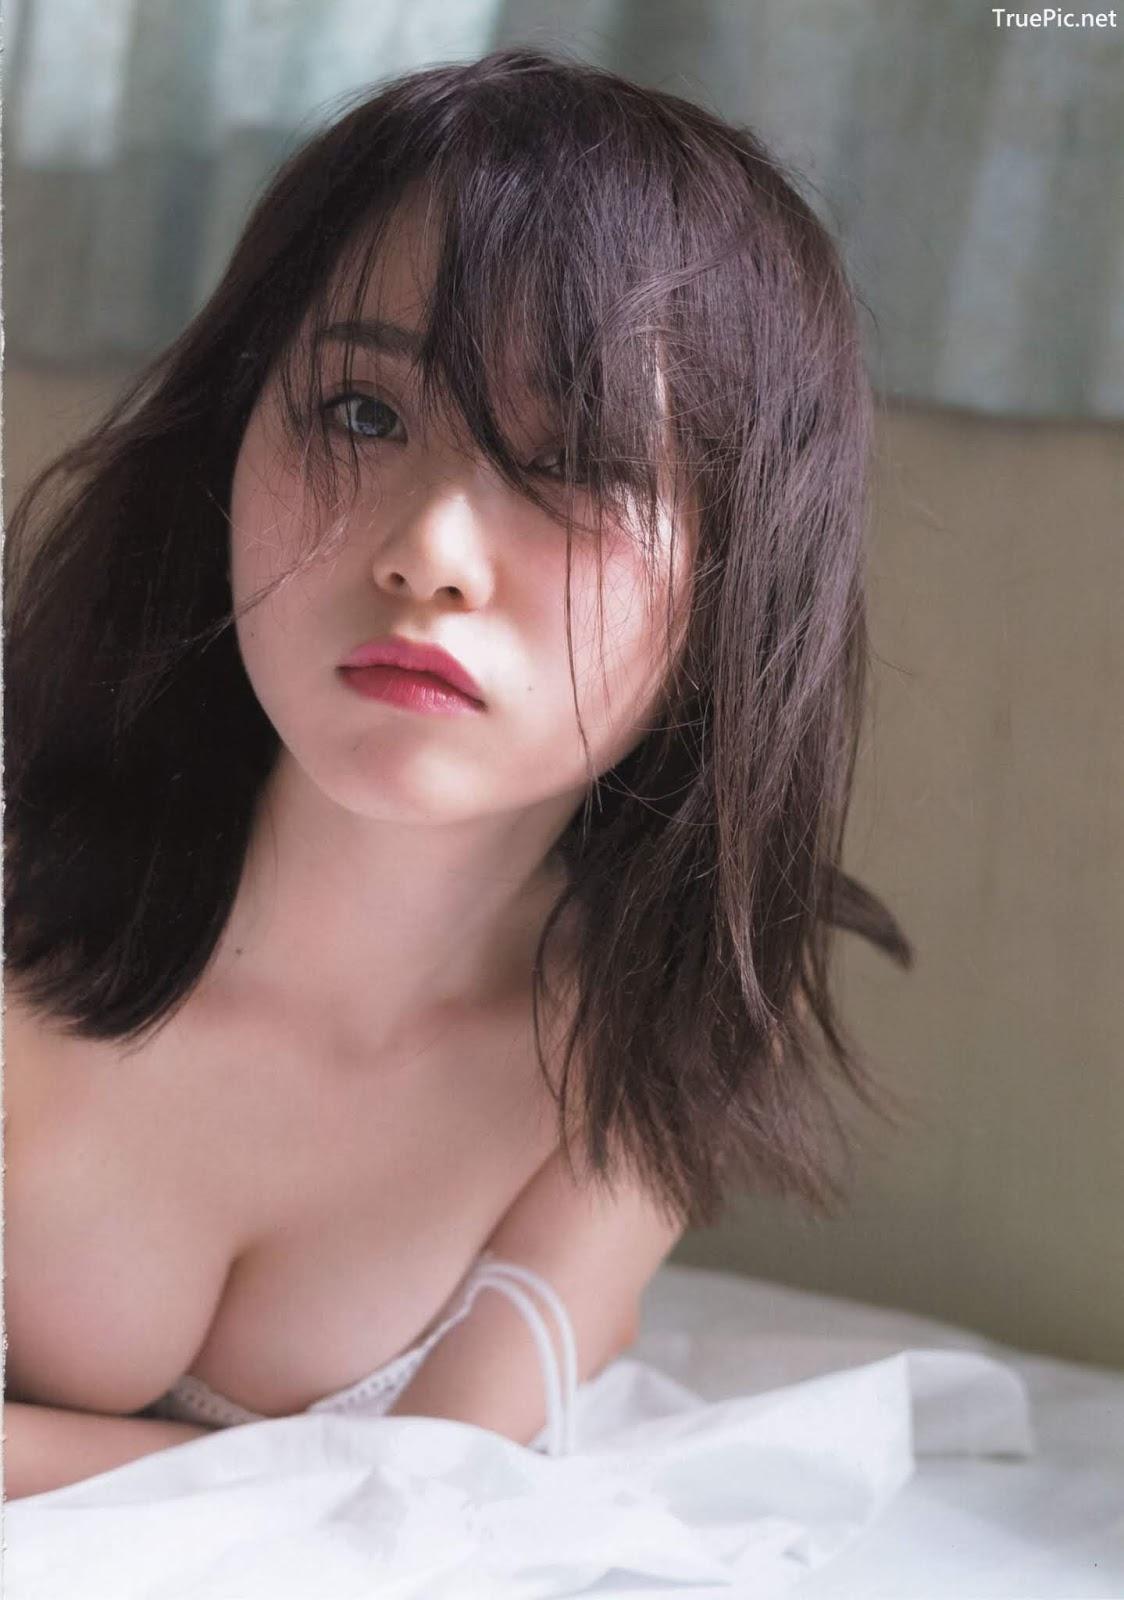 Image Japanese Beauty - Juri Takahashi - Ambiguous Self - TruePic.net - Picture-3